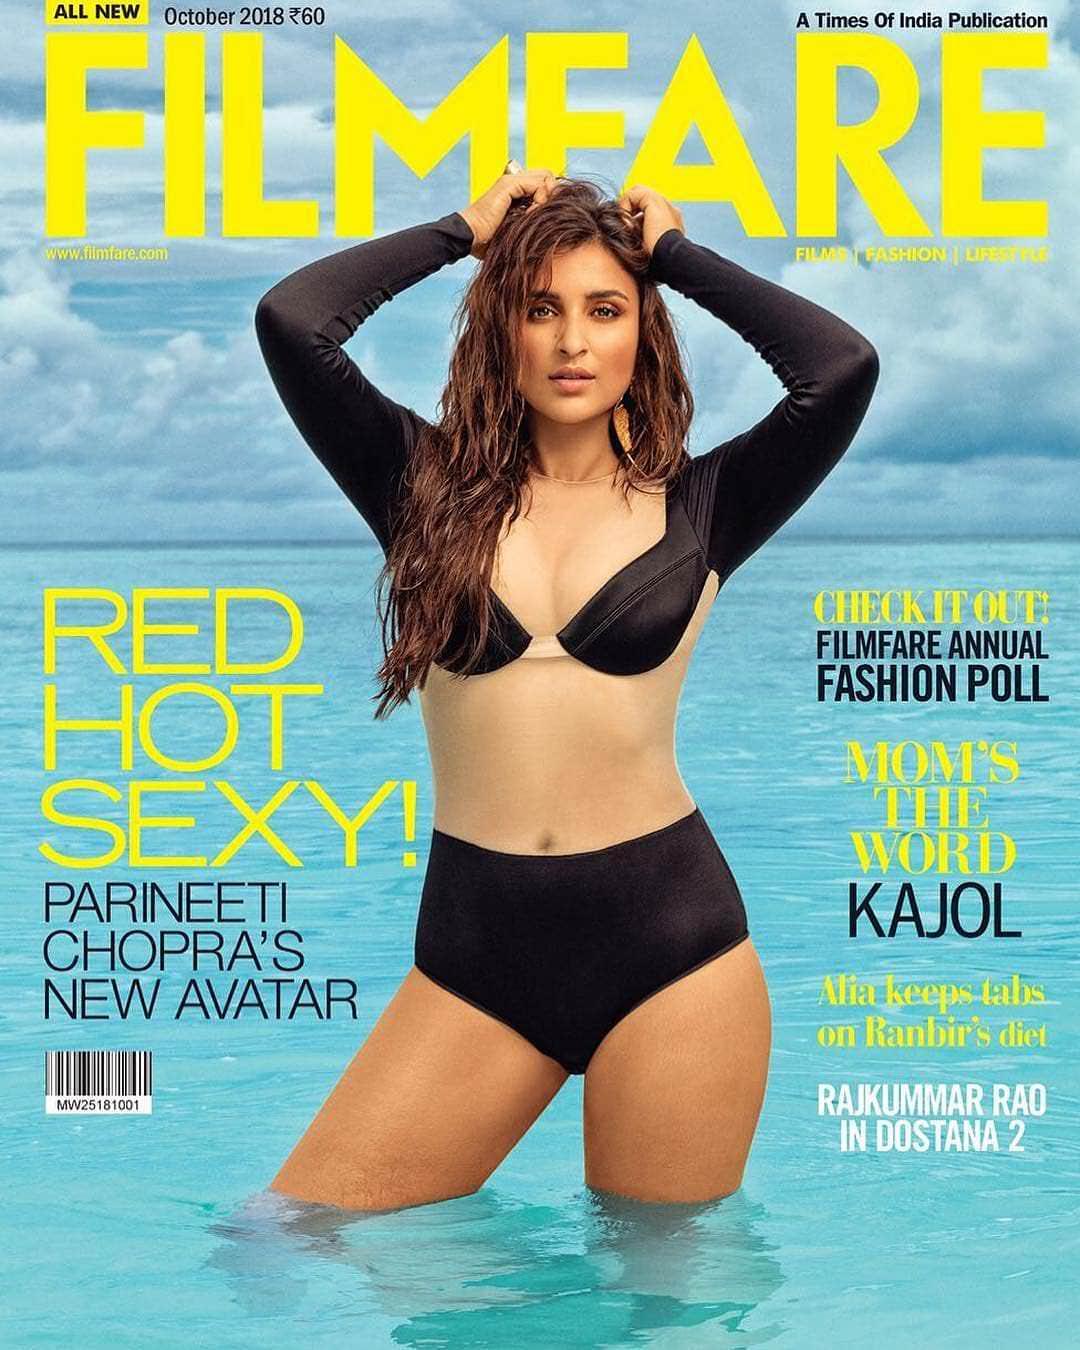 Parineeti Chopra hot and sexy filmfair photoshoot still